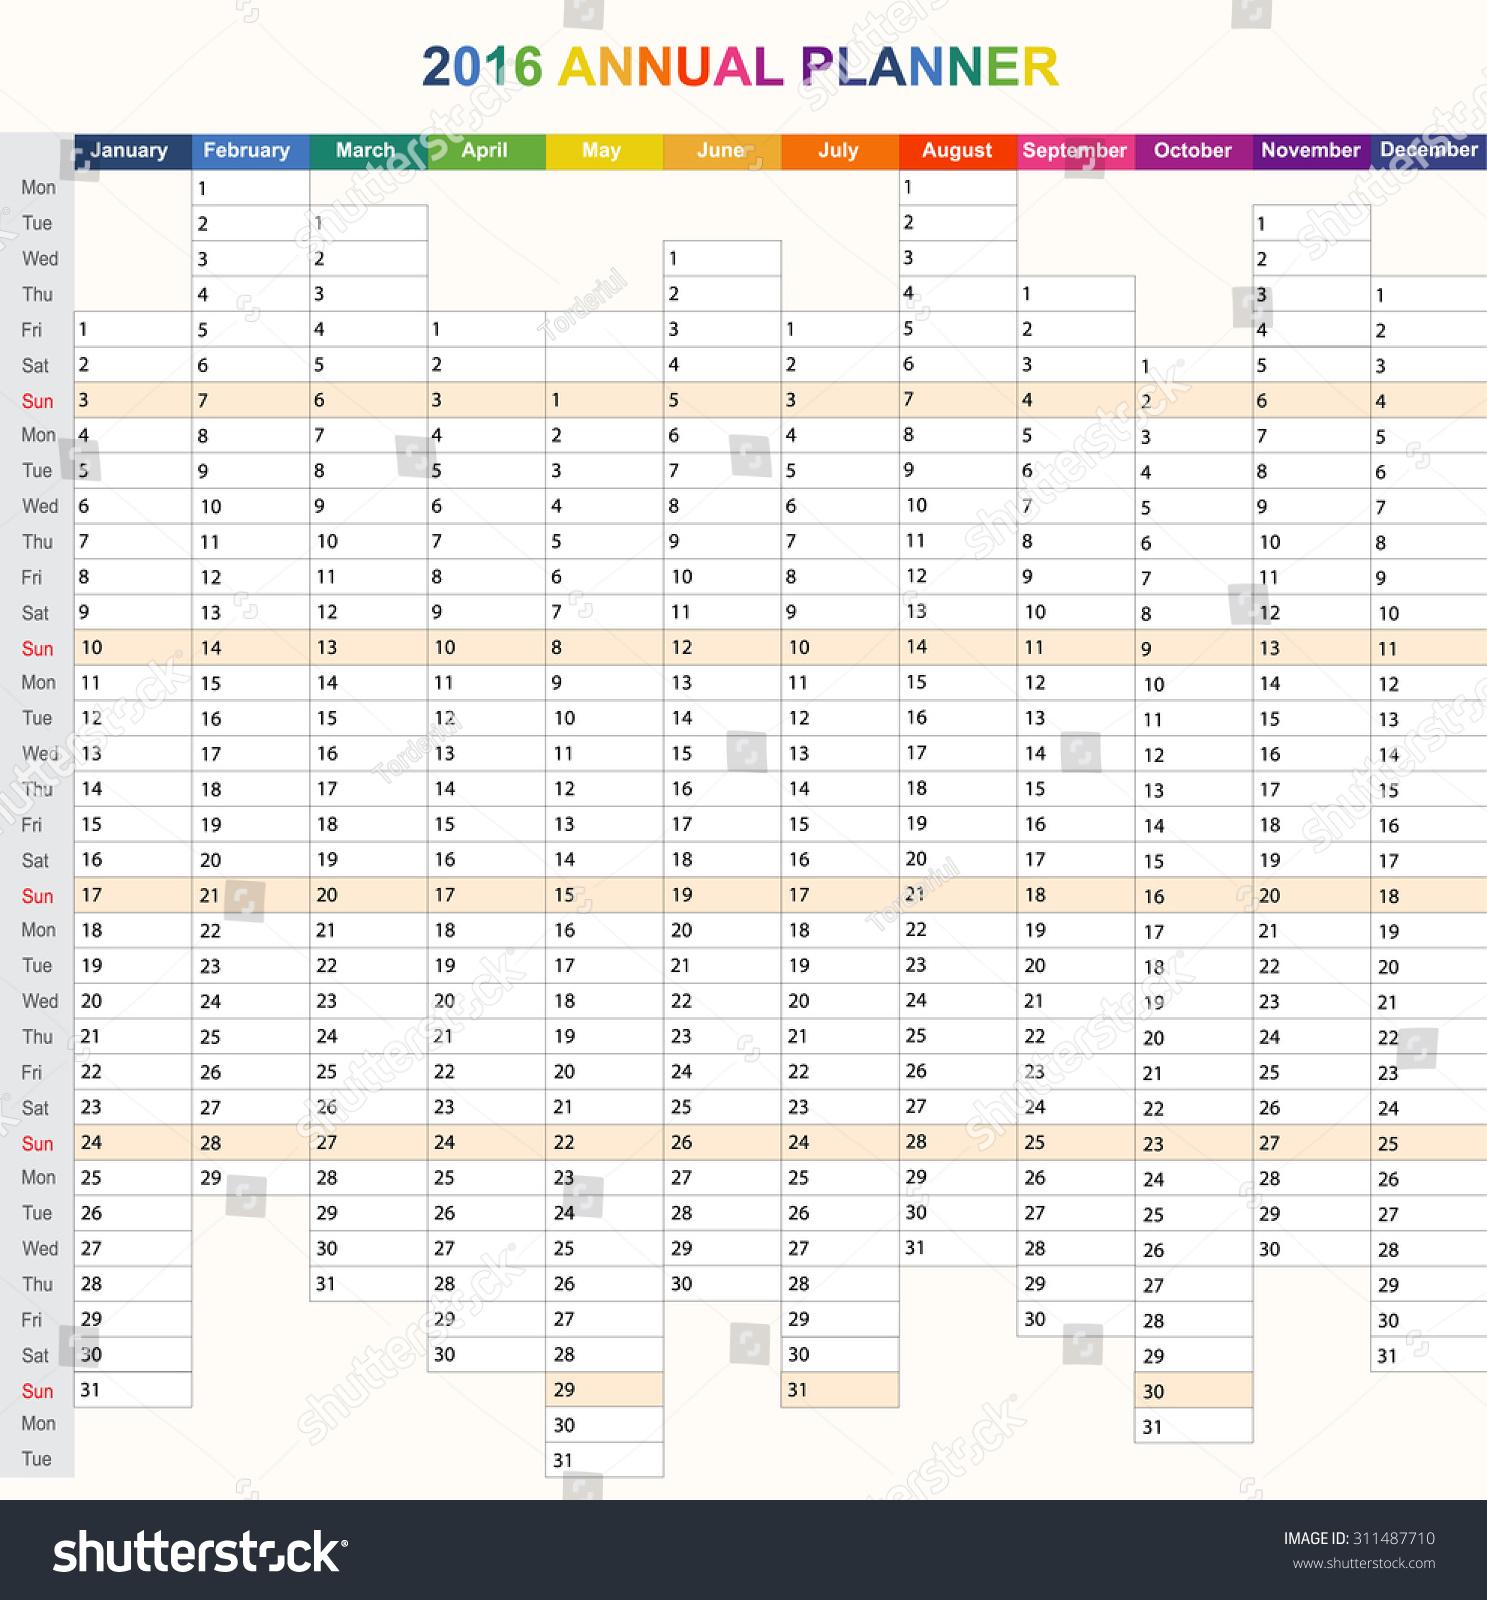 daily organizer template – Daily Organizer Template